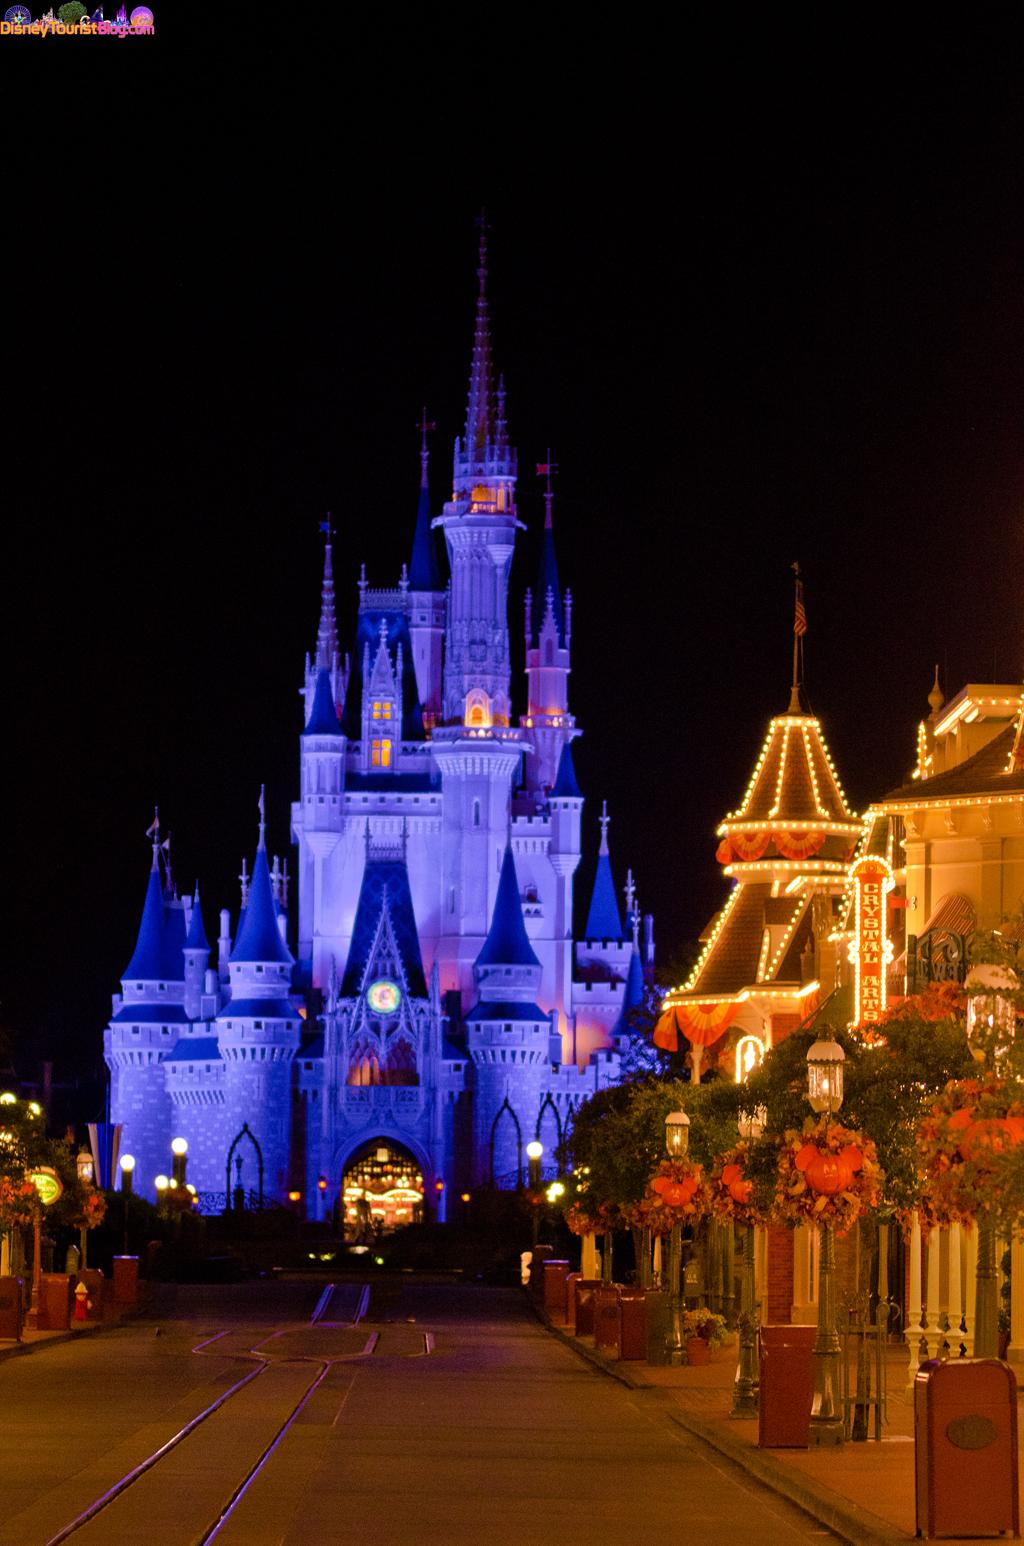 Scavenger Hunt List >> Heart of Darkness - Disney Photo of the Day - Disney Tourist Blog